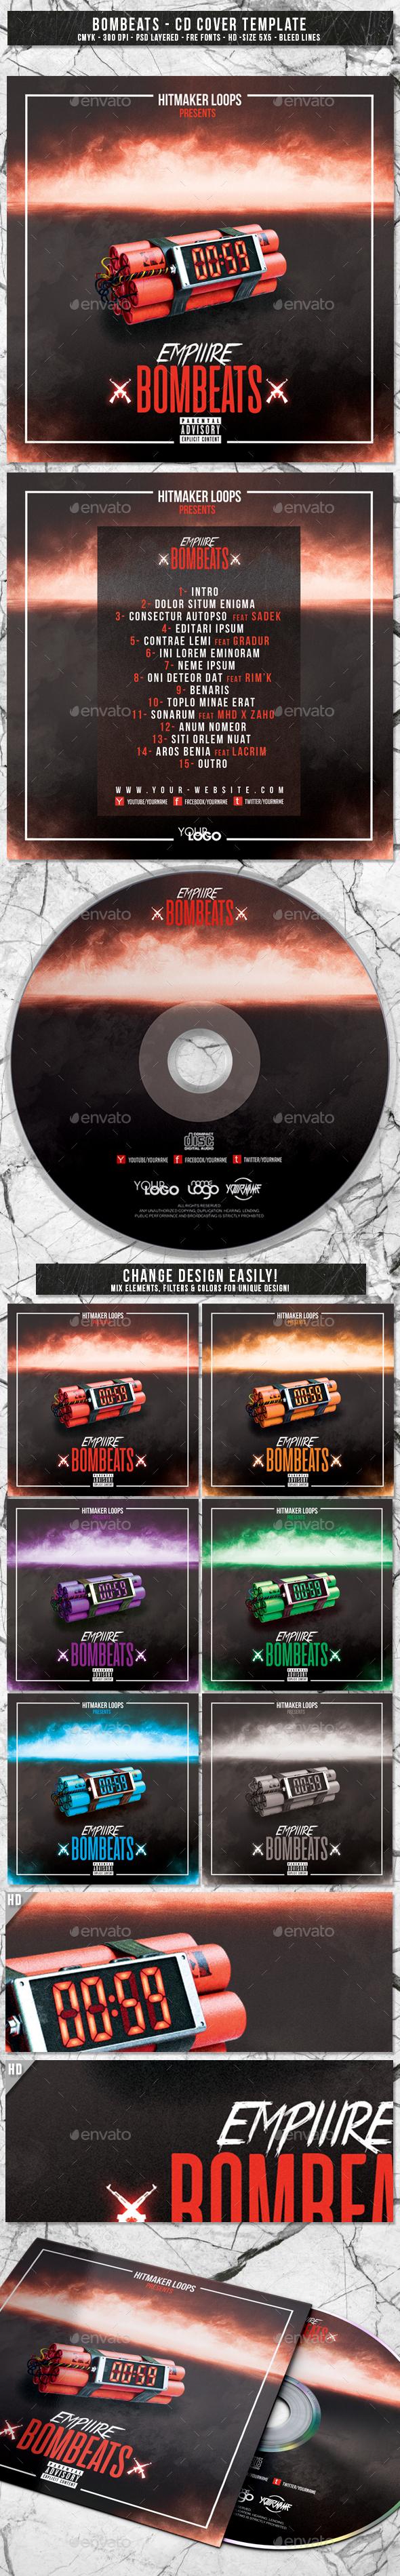 Bombeats | Album CD Mixtape Cover Template - CD & DVD Artwork Print Templates